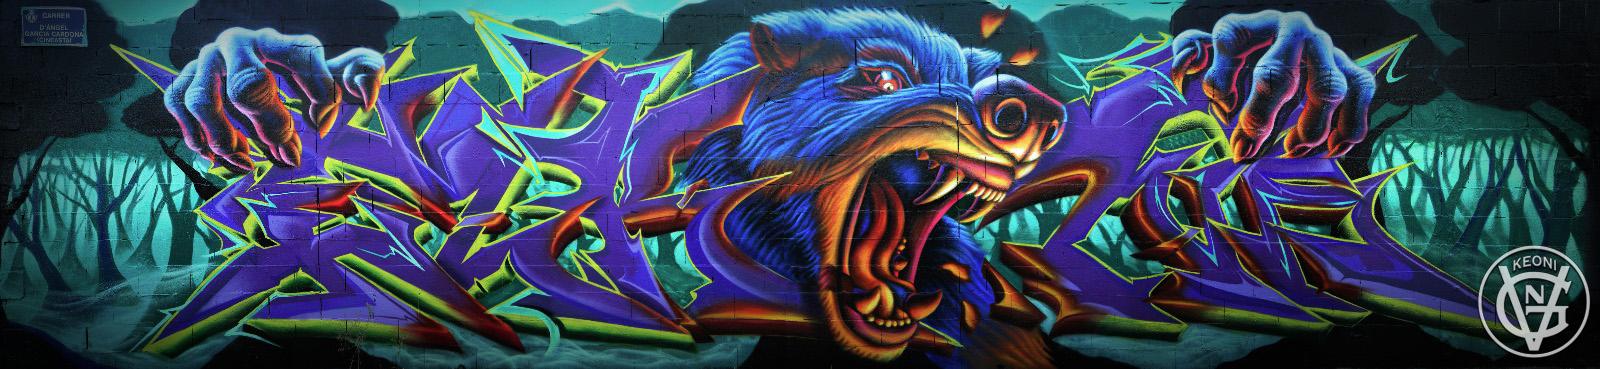 Moonlight Roar, Mural junto a mi compañero de Grow Up Crew Elrond, Valencia, Spain, 2017.